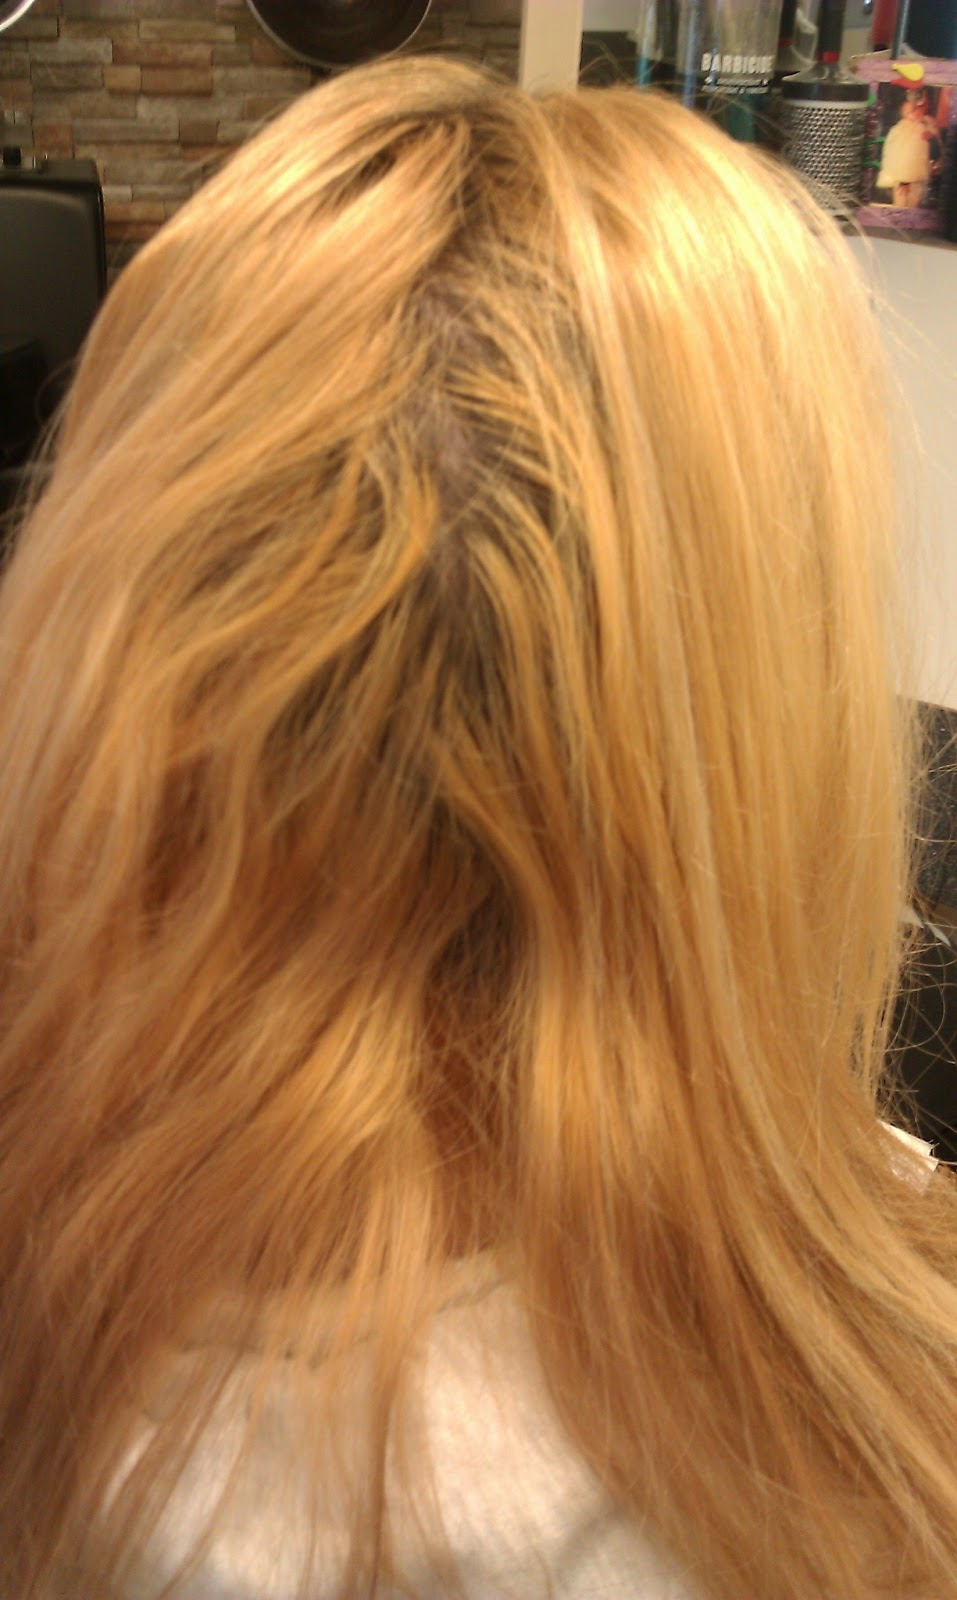 Hair Extensions By Jaclynn Kate Long Hair Extensions